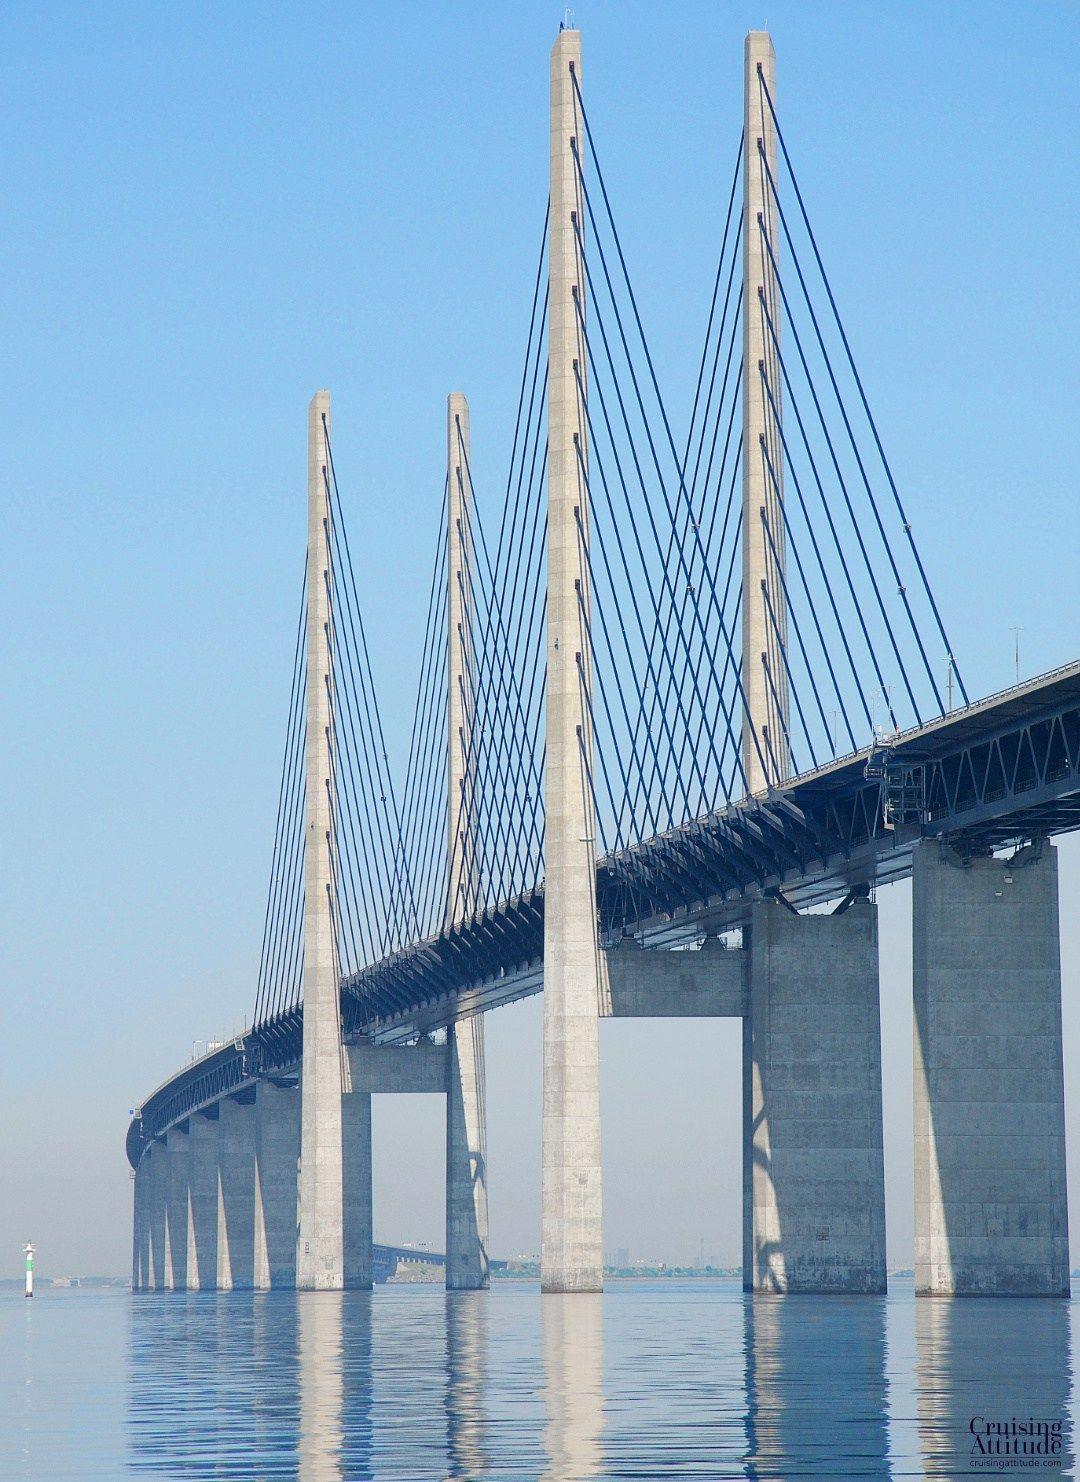 Oresund Bridge On The Malmo Sweden Side Cruising Attitude Sailing Blog Sweden Travel Malmo Scandinavia Travel